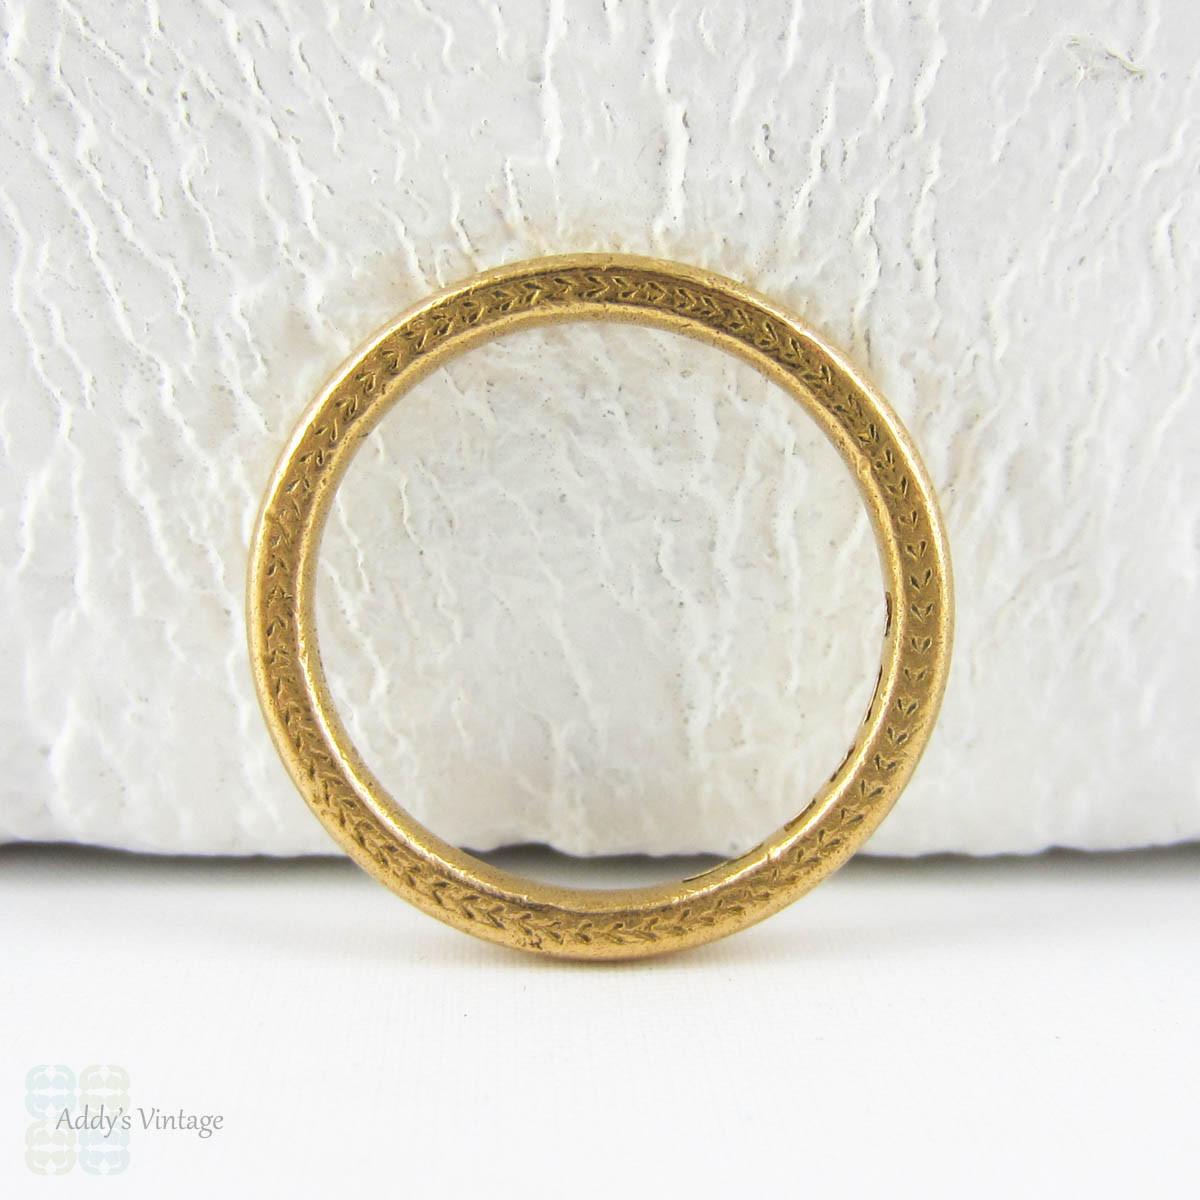 1930s Wedding Ring, 22 Carat Gold Wedding Band With. 1.0 Carat Wedding Rings. Relationship Engagement Rings. Weaved Engagement Rings. Wedding Dutch Engagement Rings. C Name Wedding Rings. Euro Coin Rings. Non Metal Wedding Rings. Busy Engagement Rings